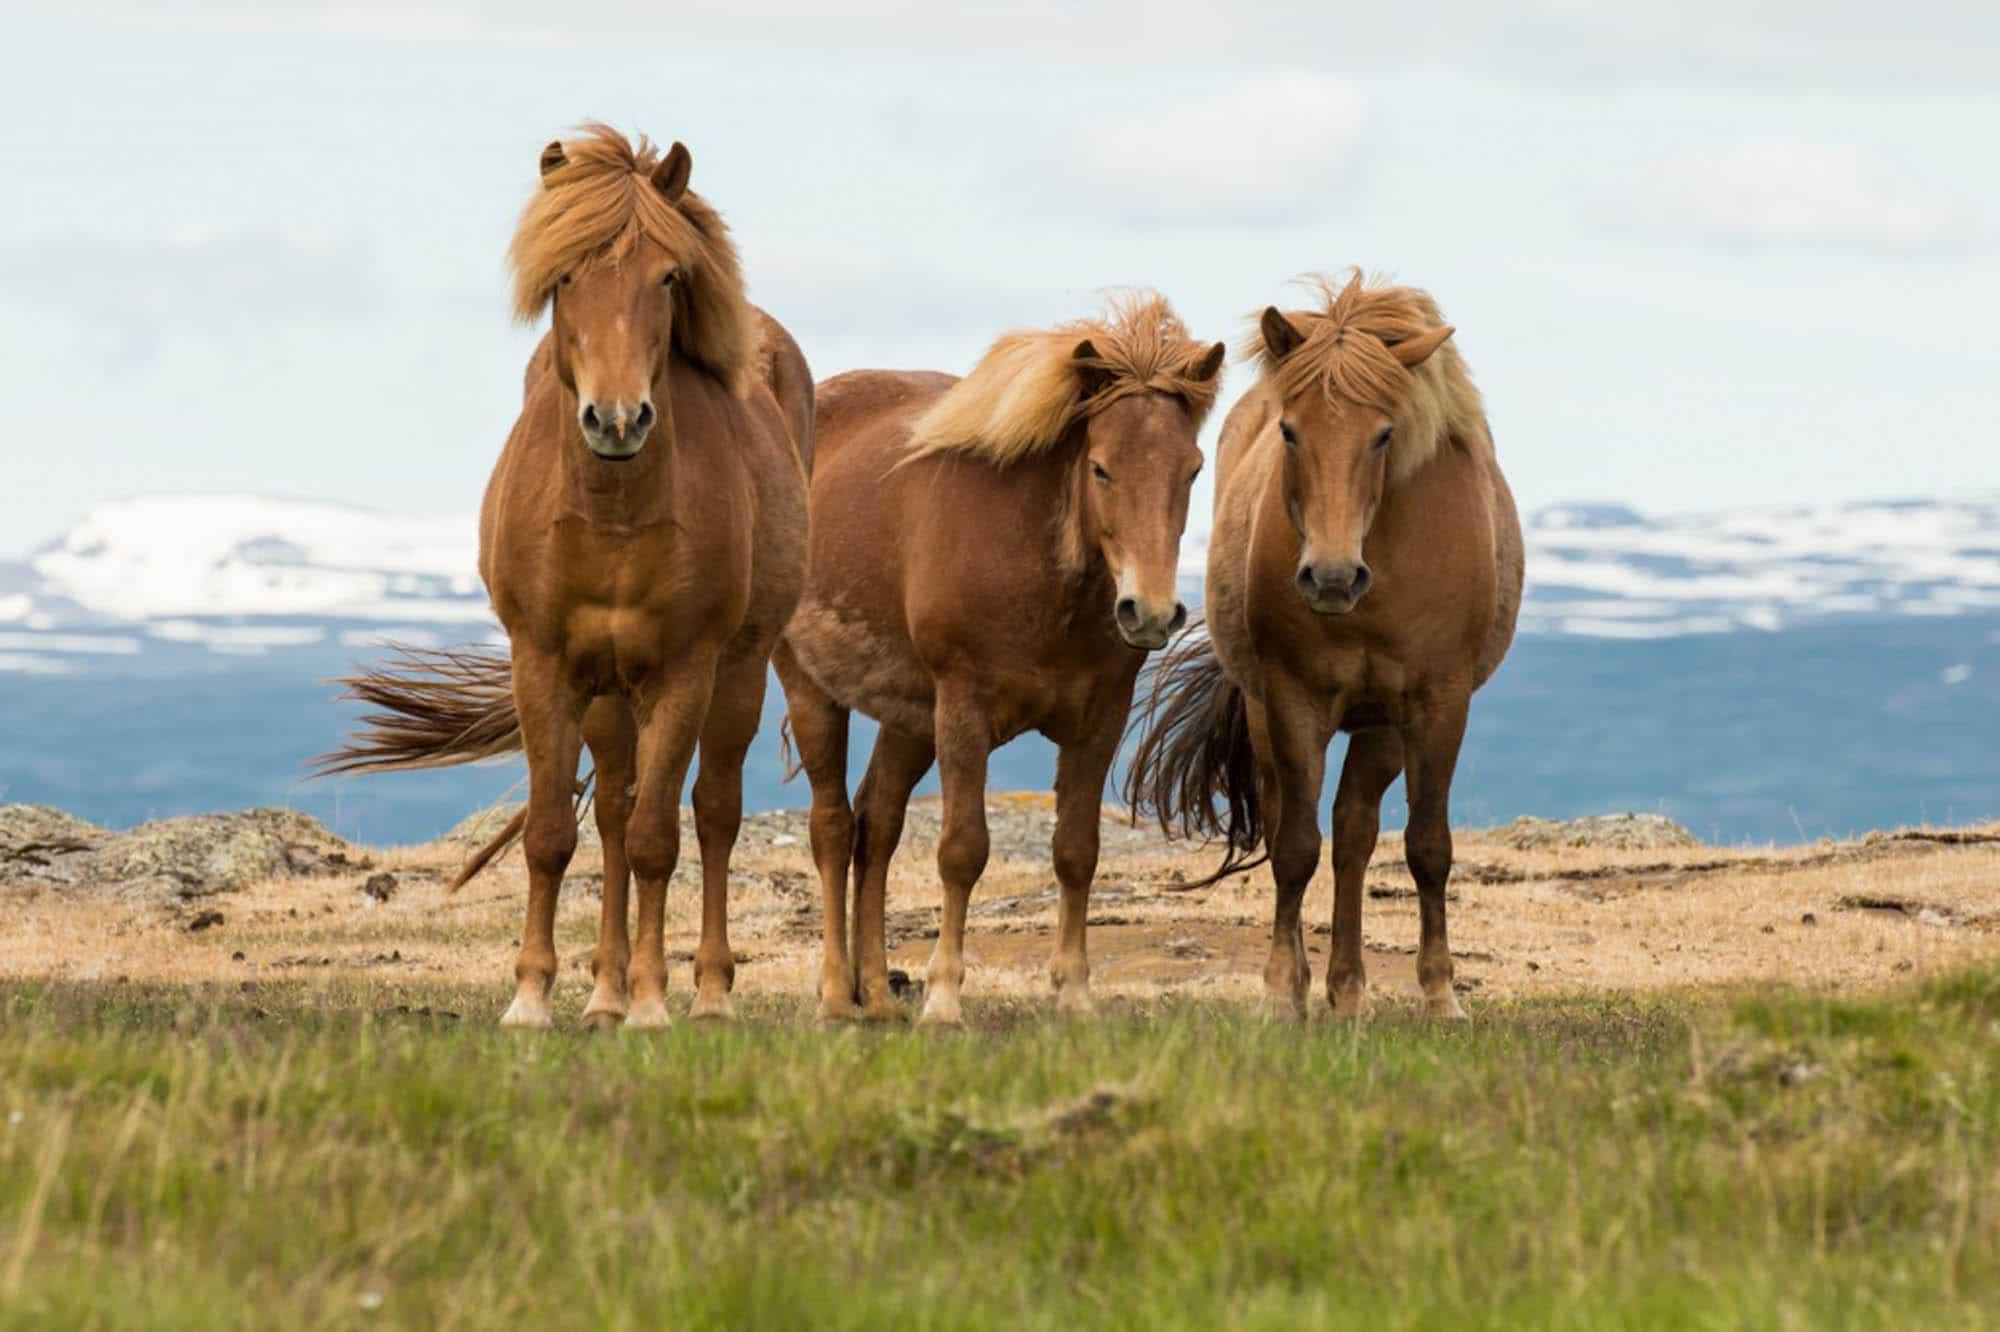 Iceland horse riding tour